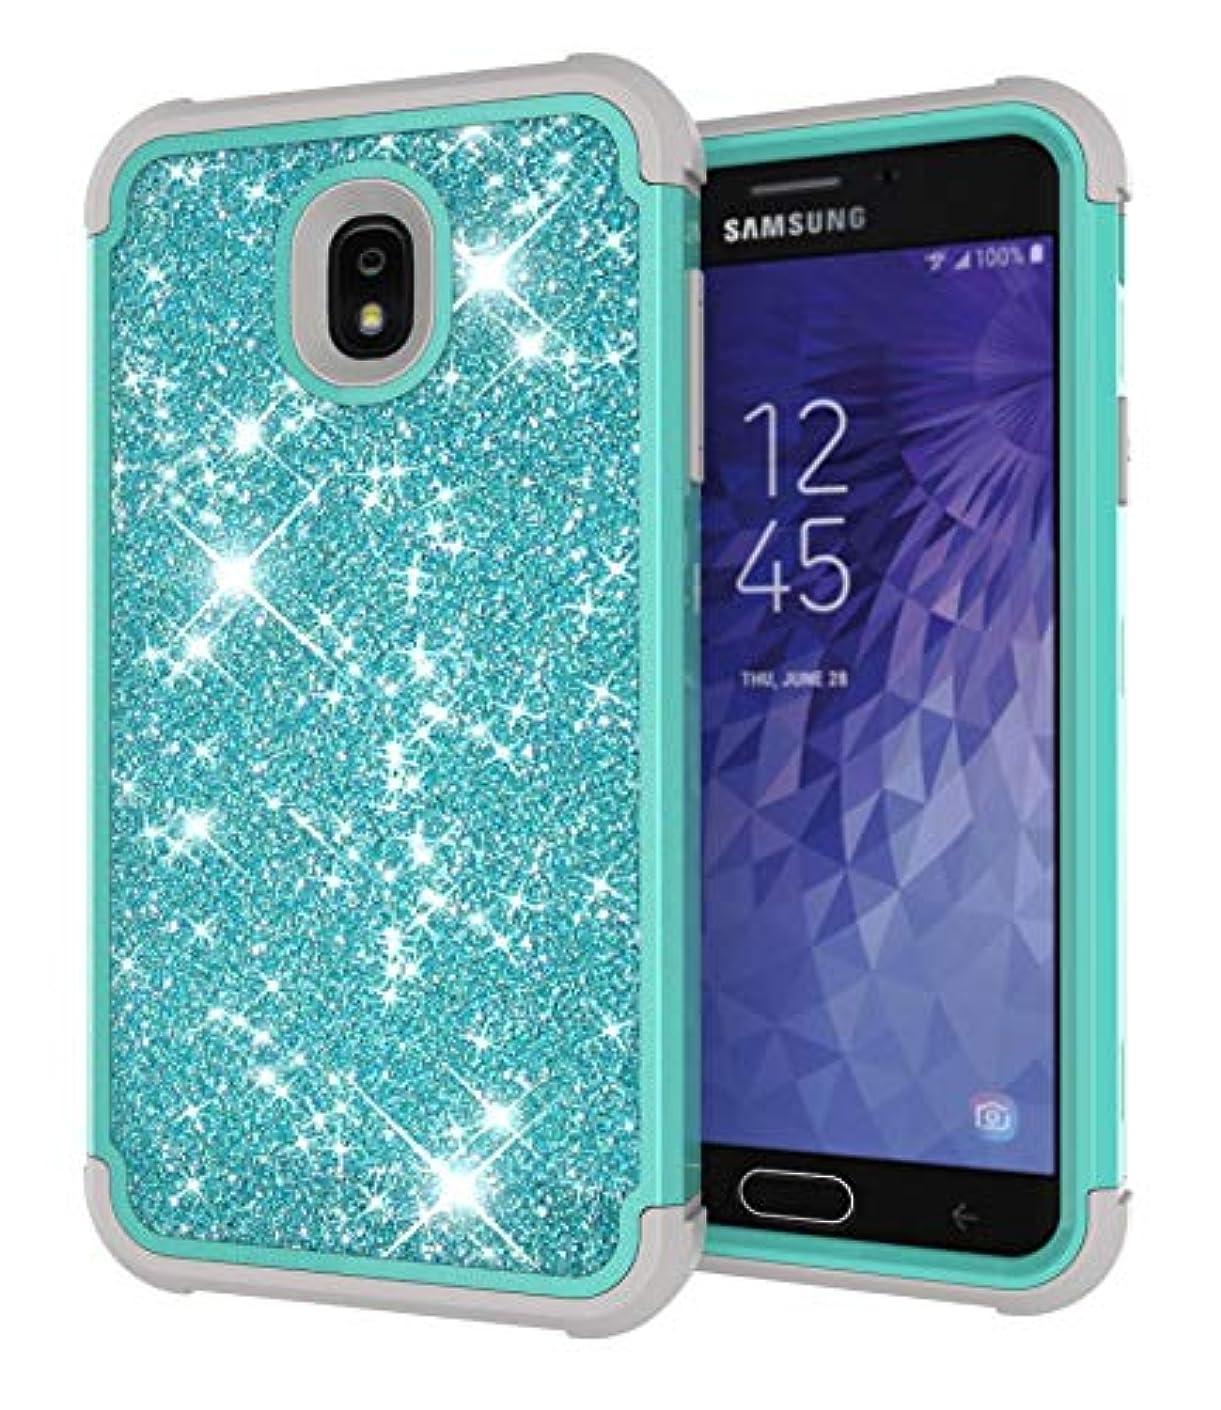 Case for Samsung Galaxy J7 2018 Wallet Case, Galaxy J7 Aero/J7 Star/J7 Top/J7 Crown/J7 Aura/J7 Refine/J7 Eon,Yoomer Shining Bling Diamond Rhinestone Luxury Glitter Sparkle Three Layer Shockproof Cover